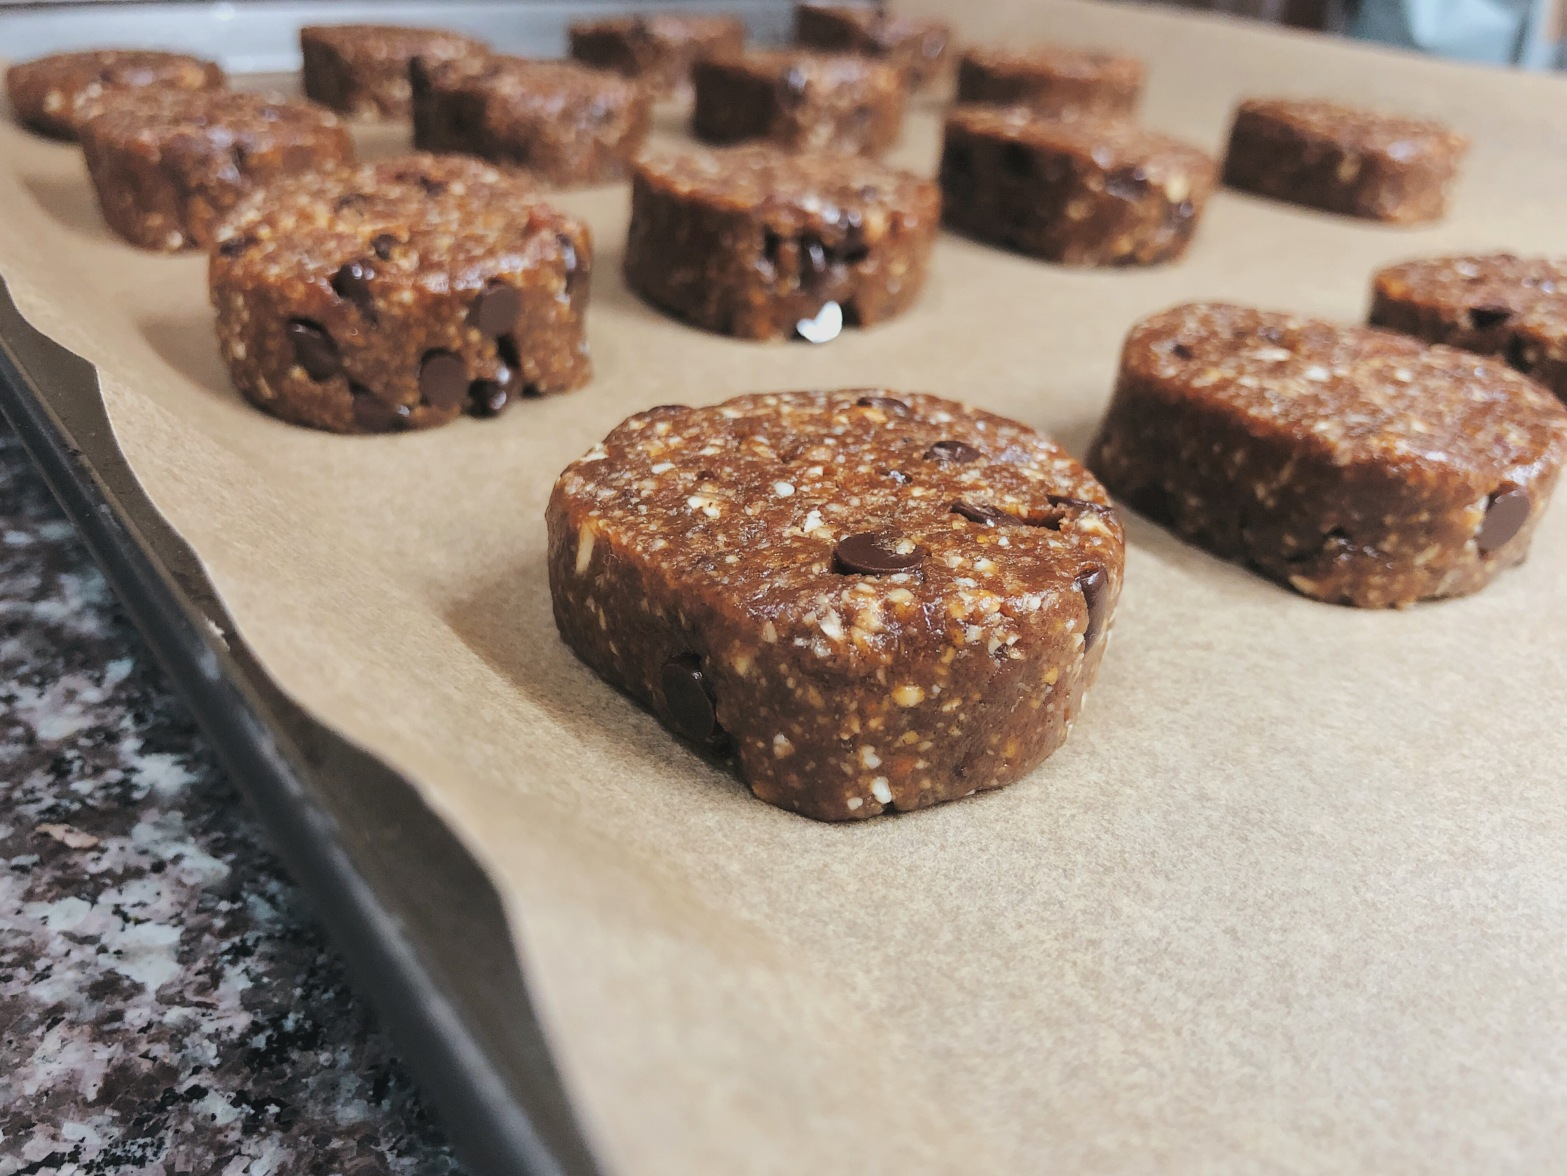 Tahini chocolate chip cookies that are raw vegan and gluten-free